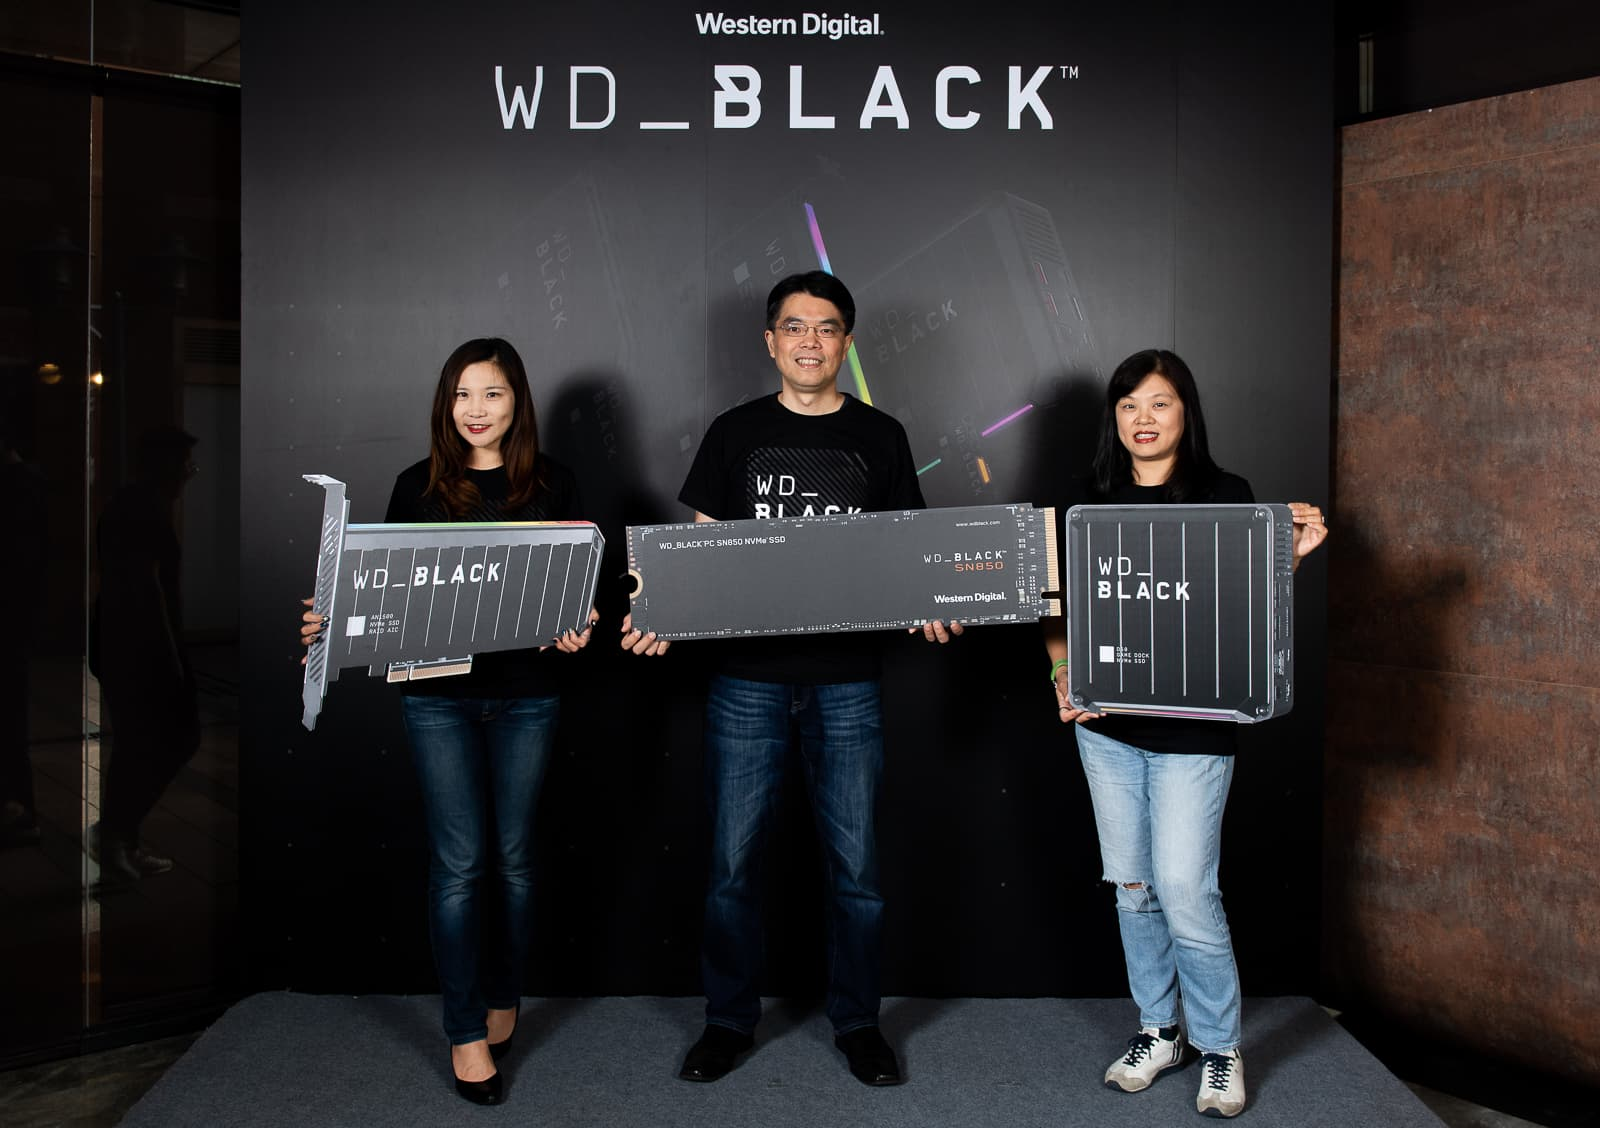 Western Digital WD_BLACK產品系列添生力軍,重新定義次世代遊戲體驗